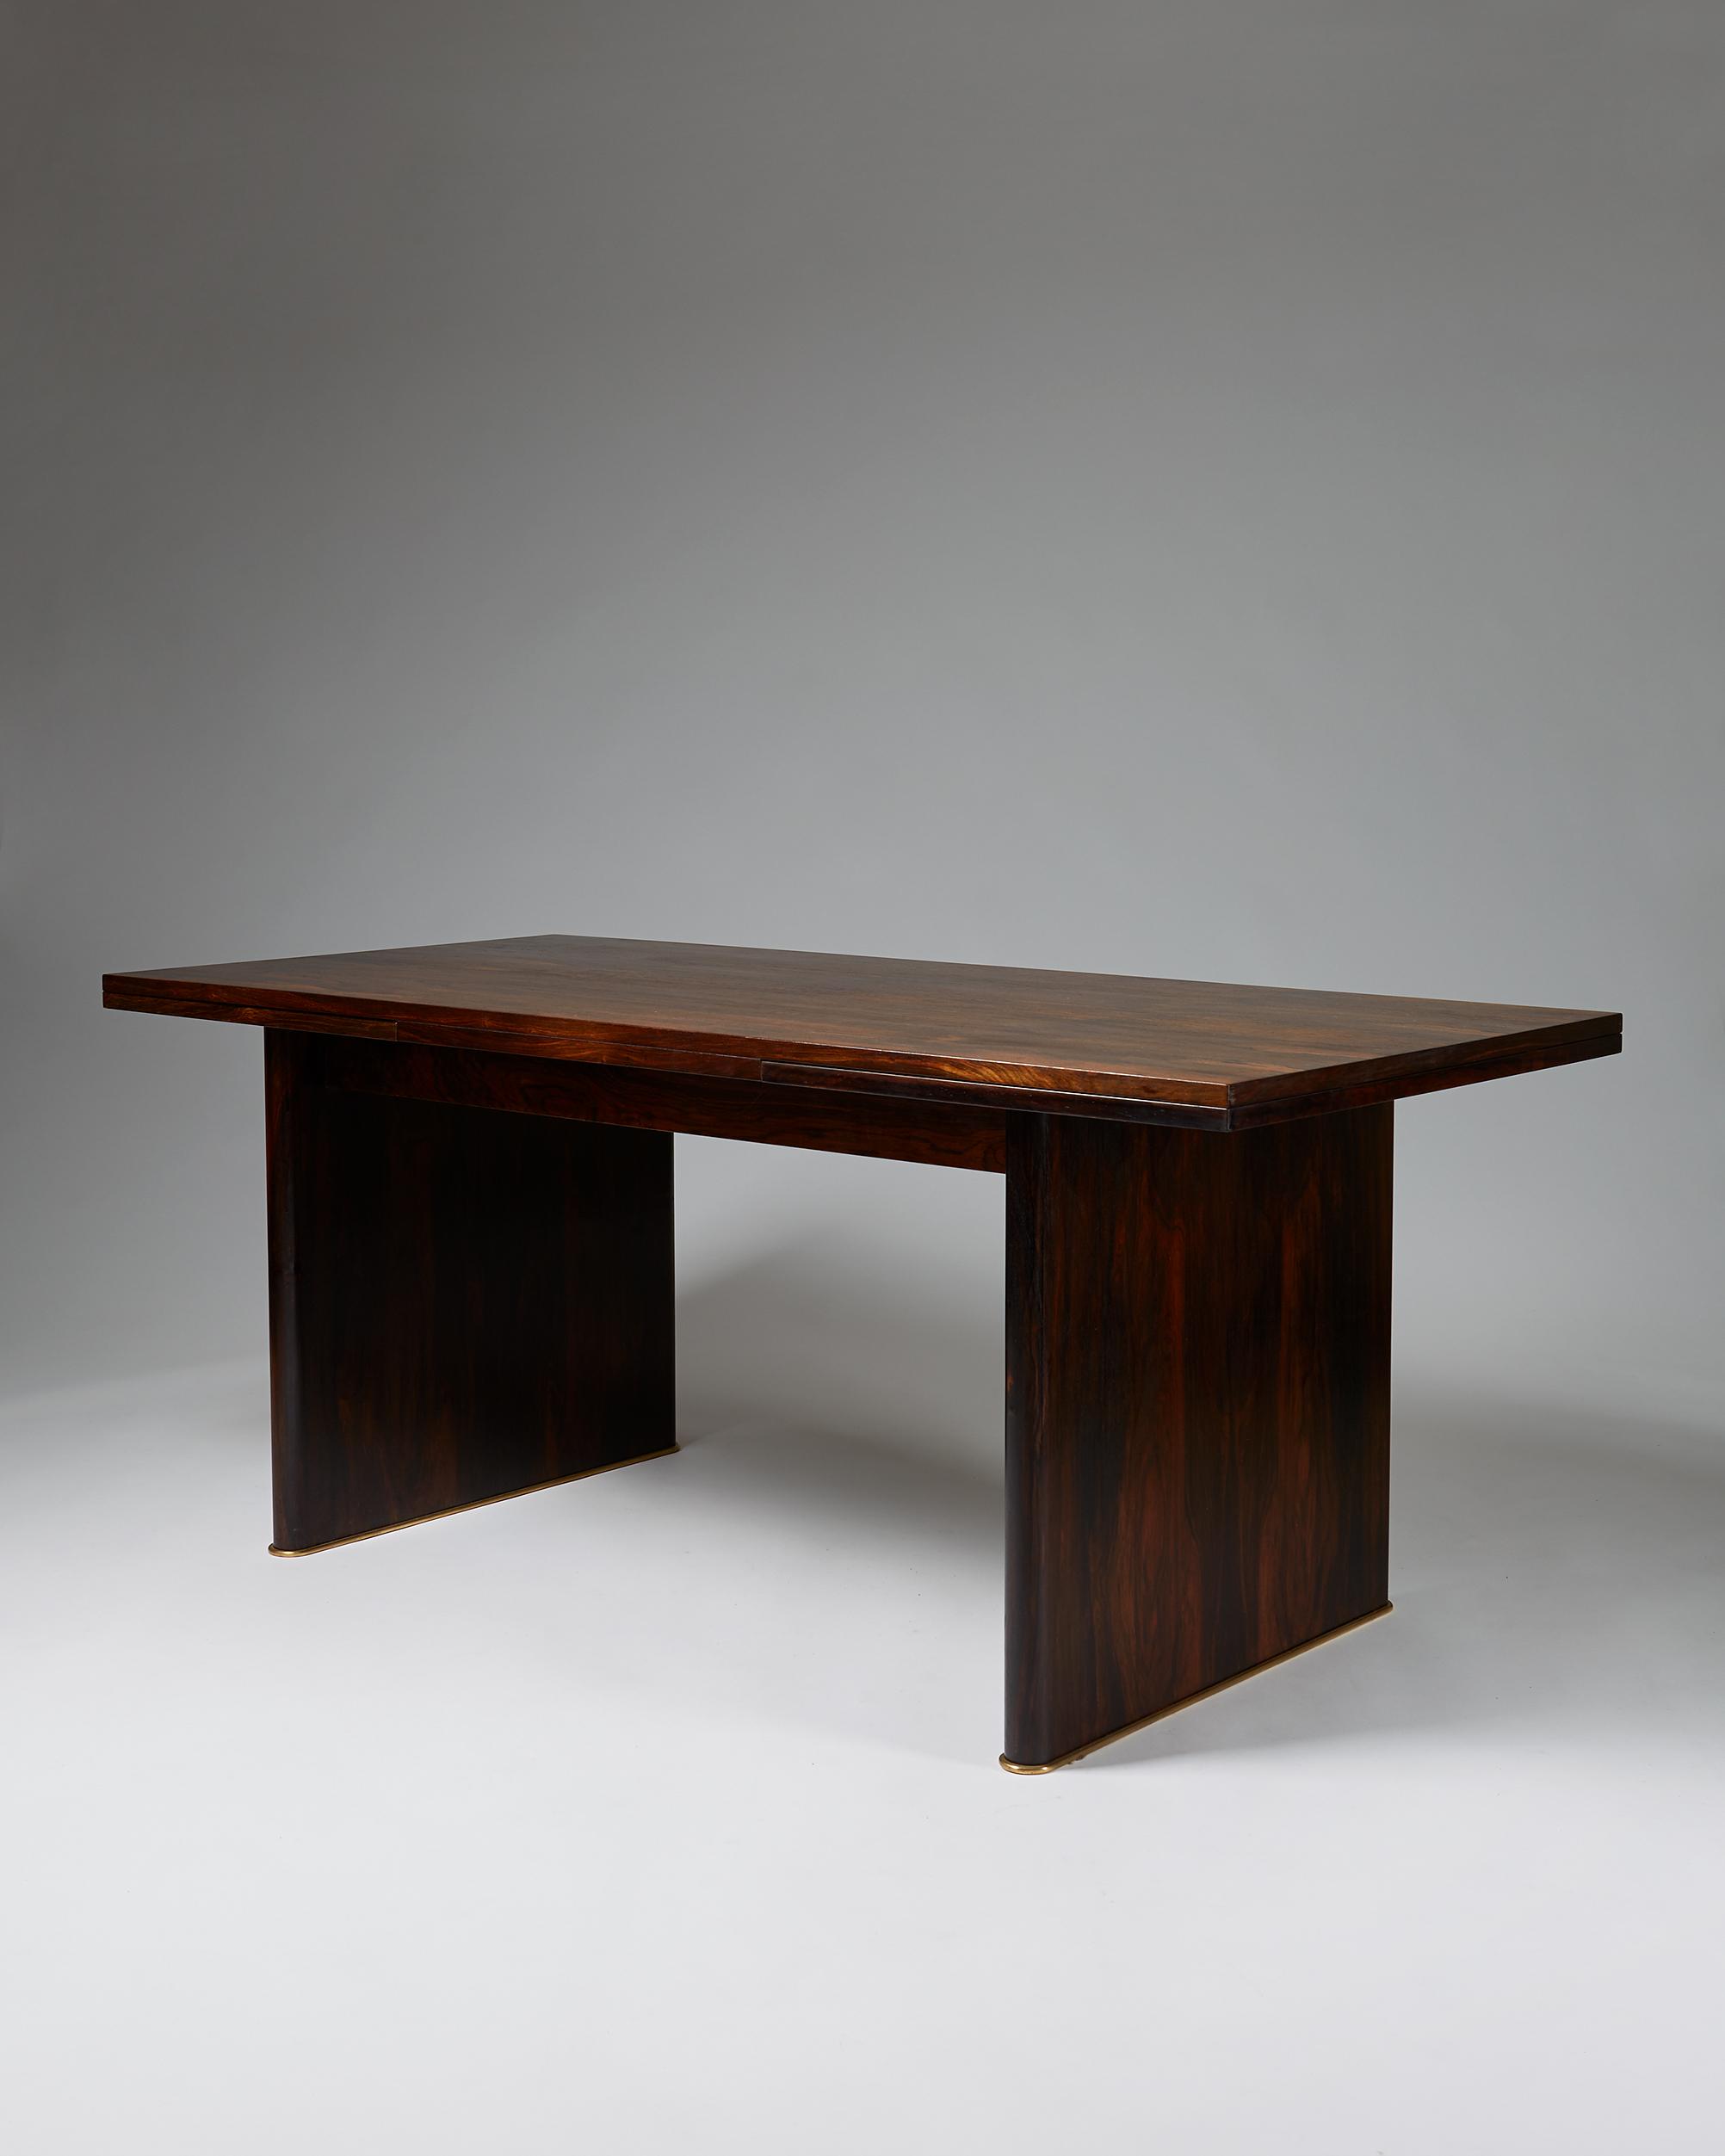 Ernst Kühn  Dining table Denmark, 1930's Brazilian rosewood and brass base. 76 x 180-300 x 85 cm